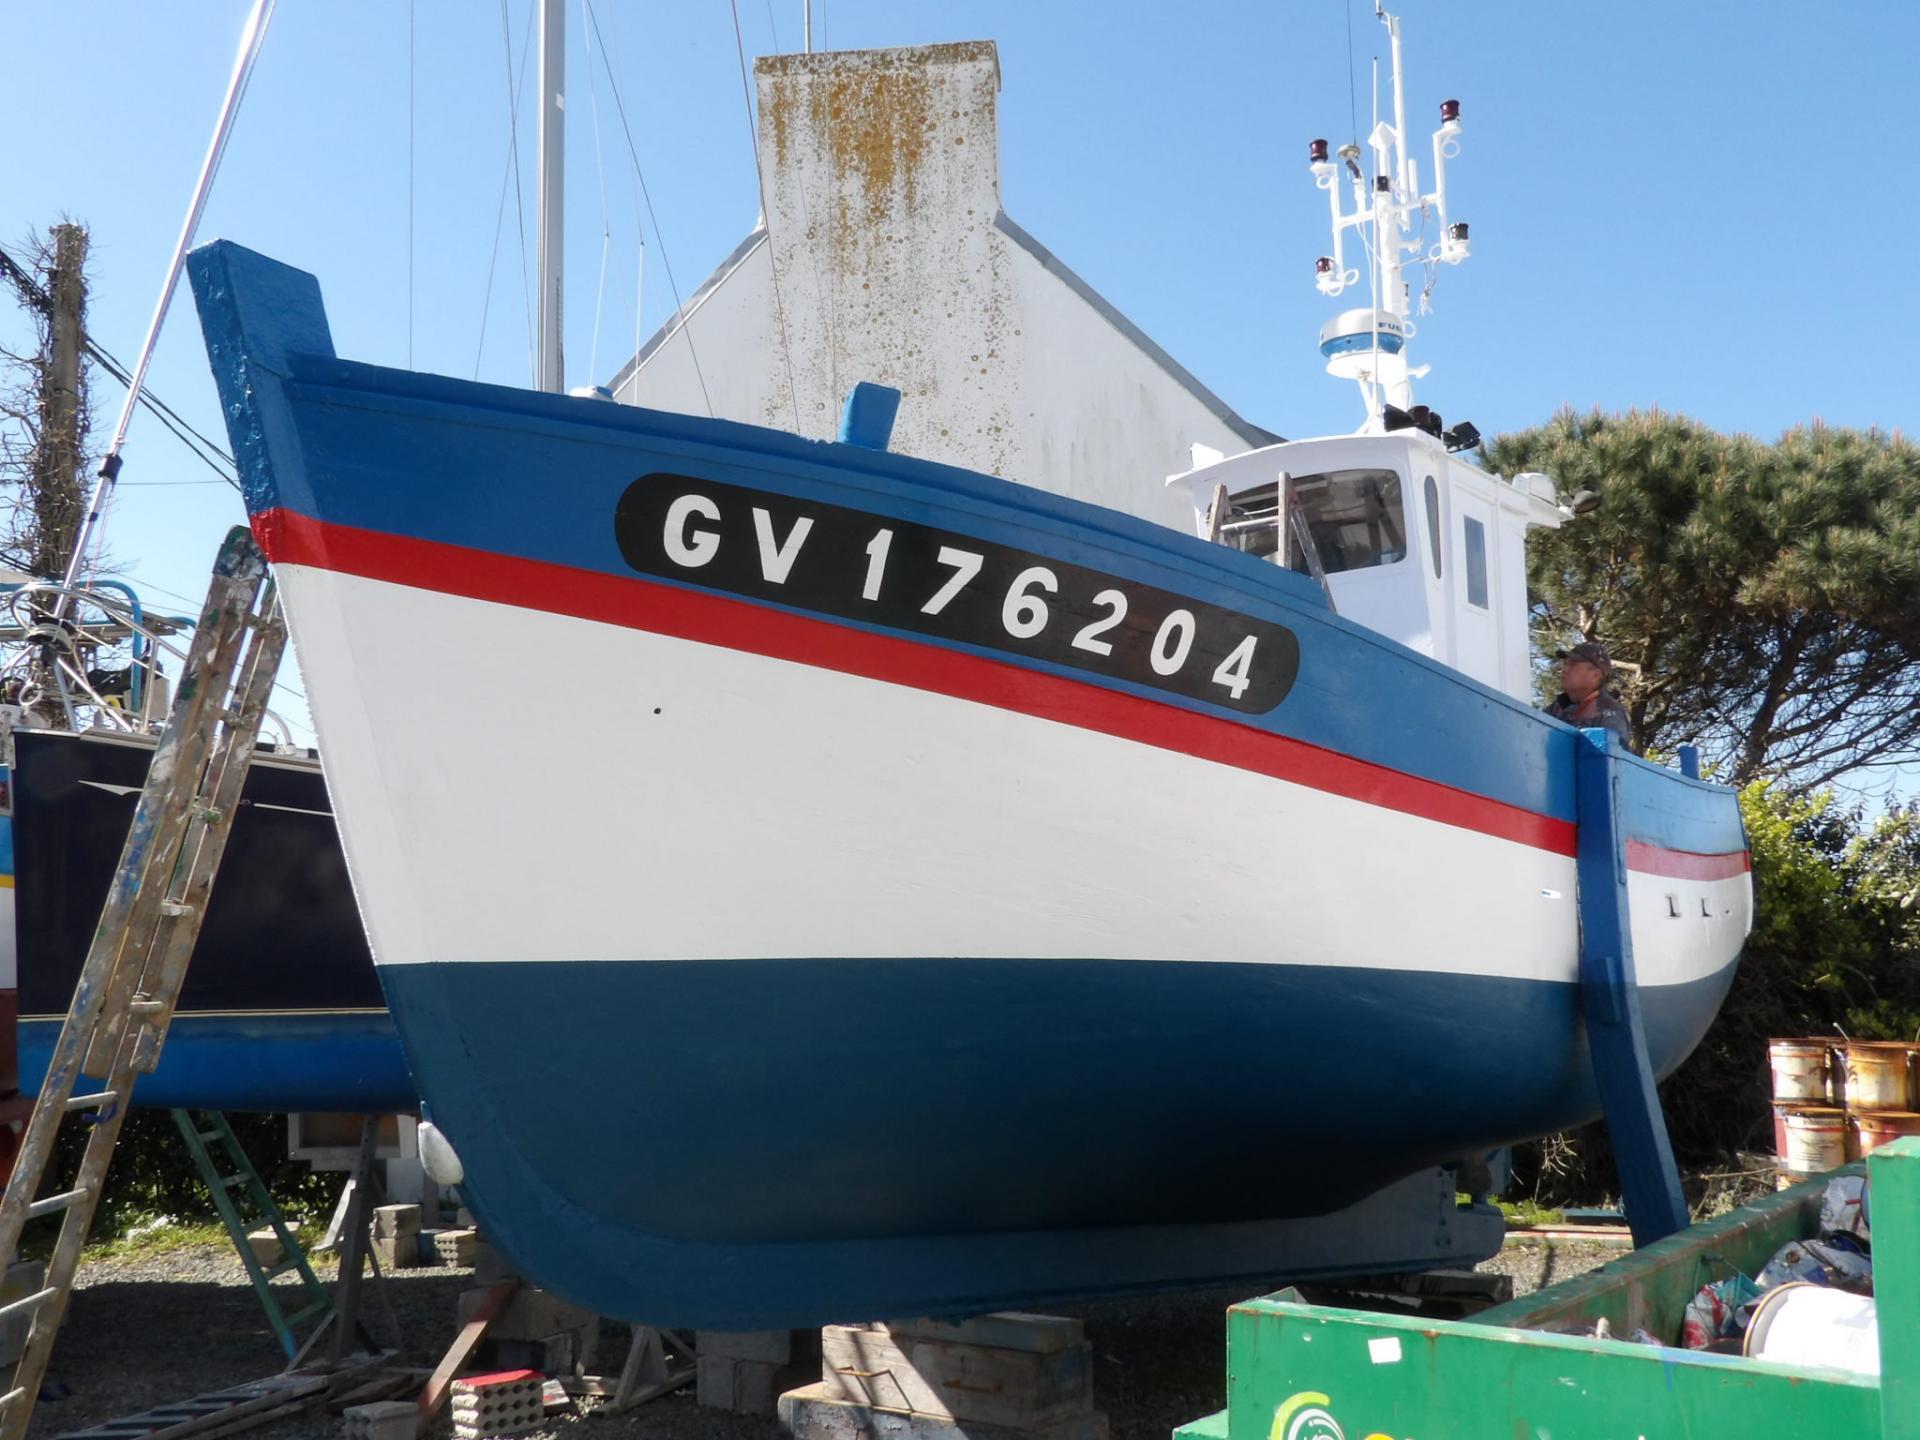 210329 requin carenage a